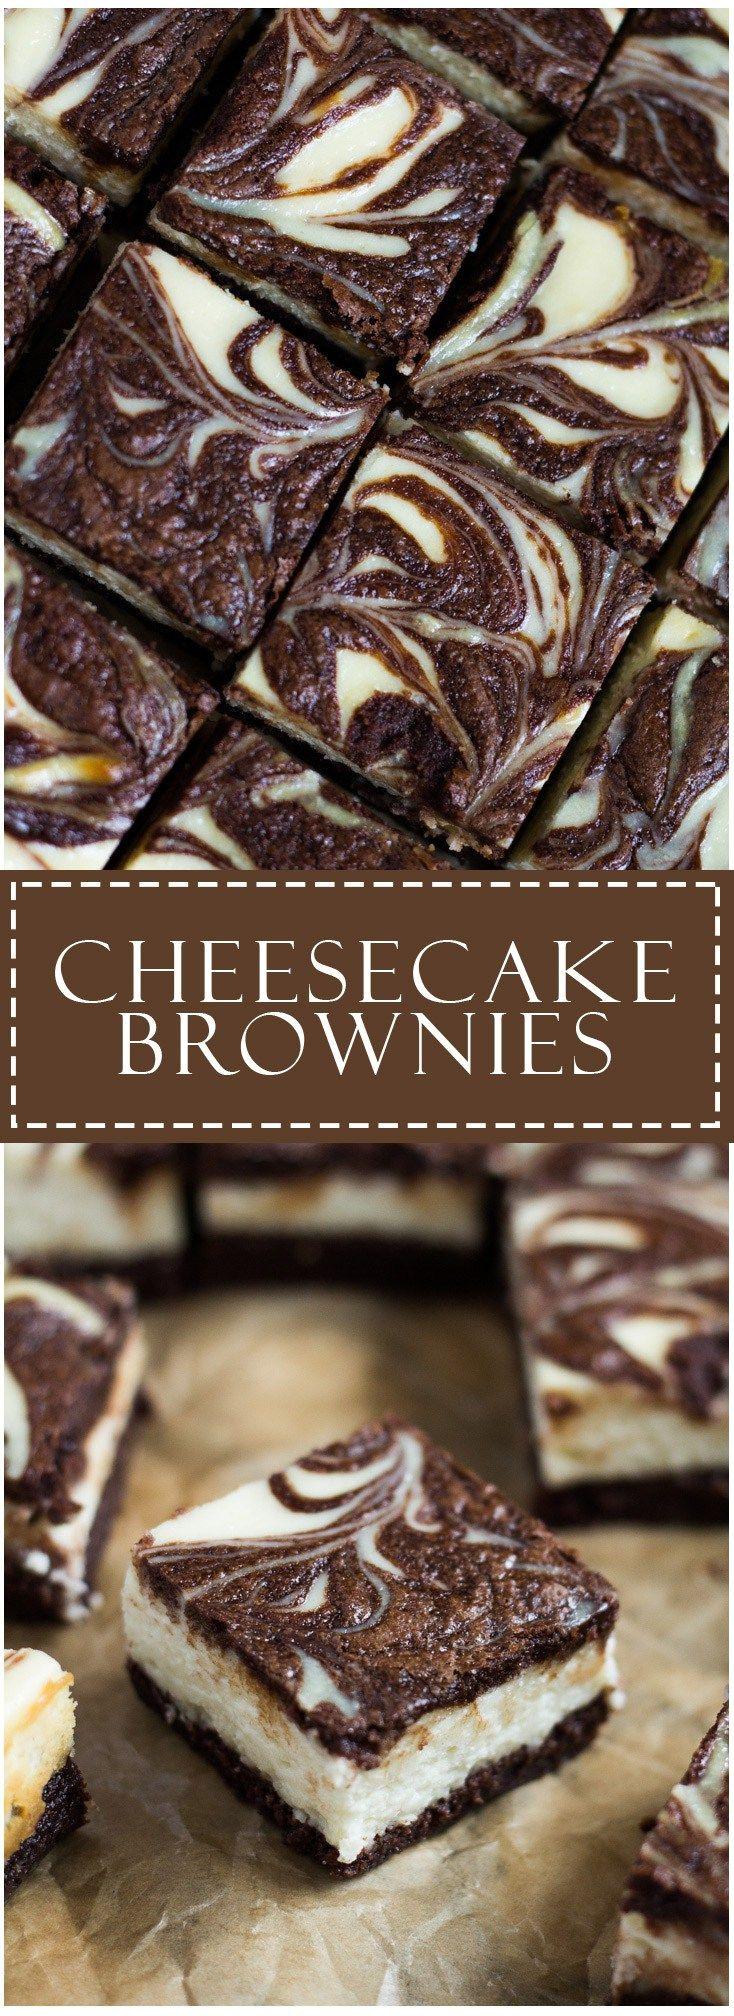 Cake Decorating Classes Worthing : Cheesecake Brownies Recipe Cheesecake brownies, Brownies and Cheesecakes